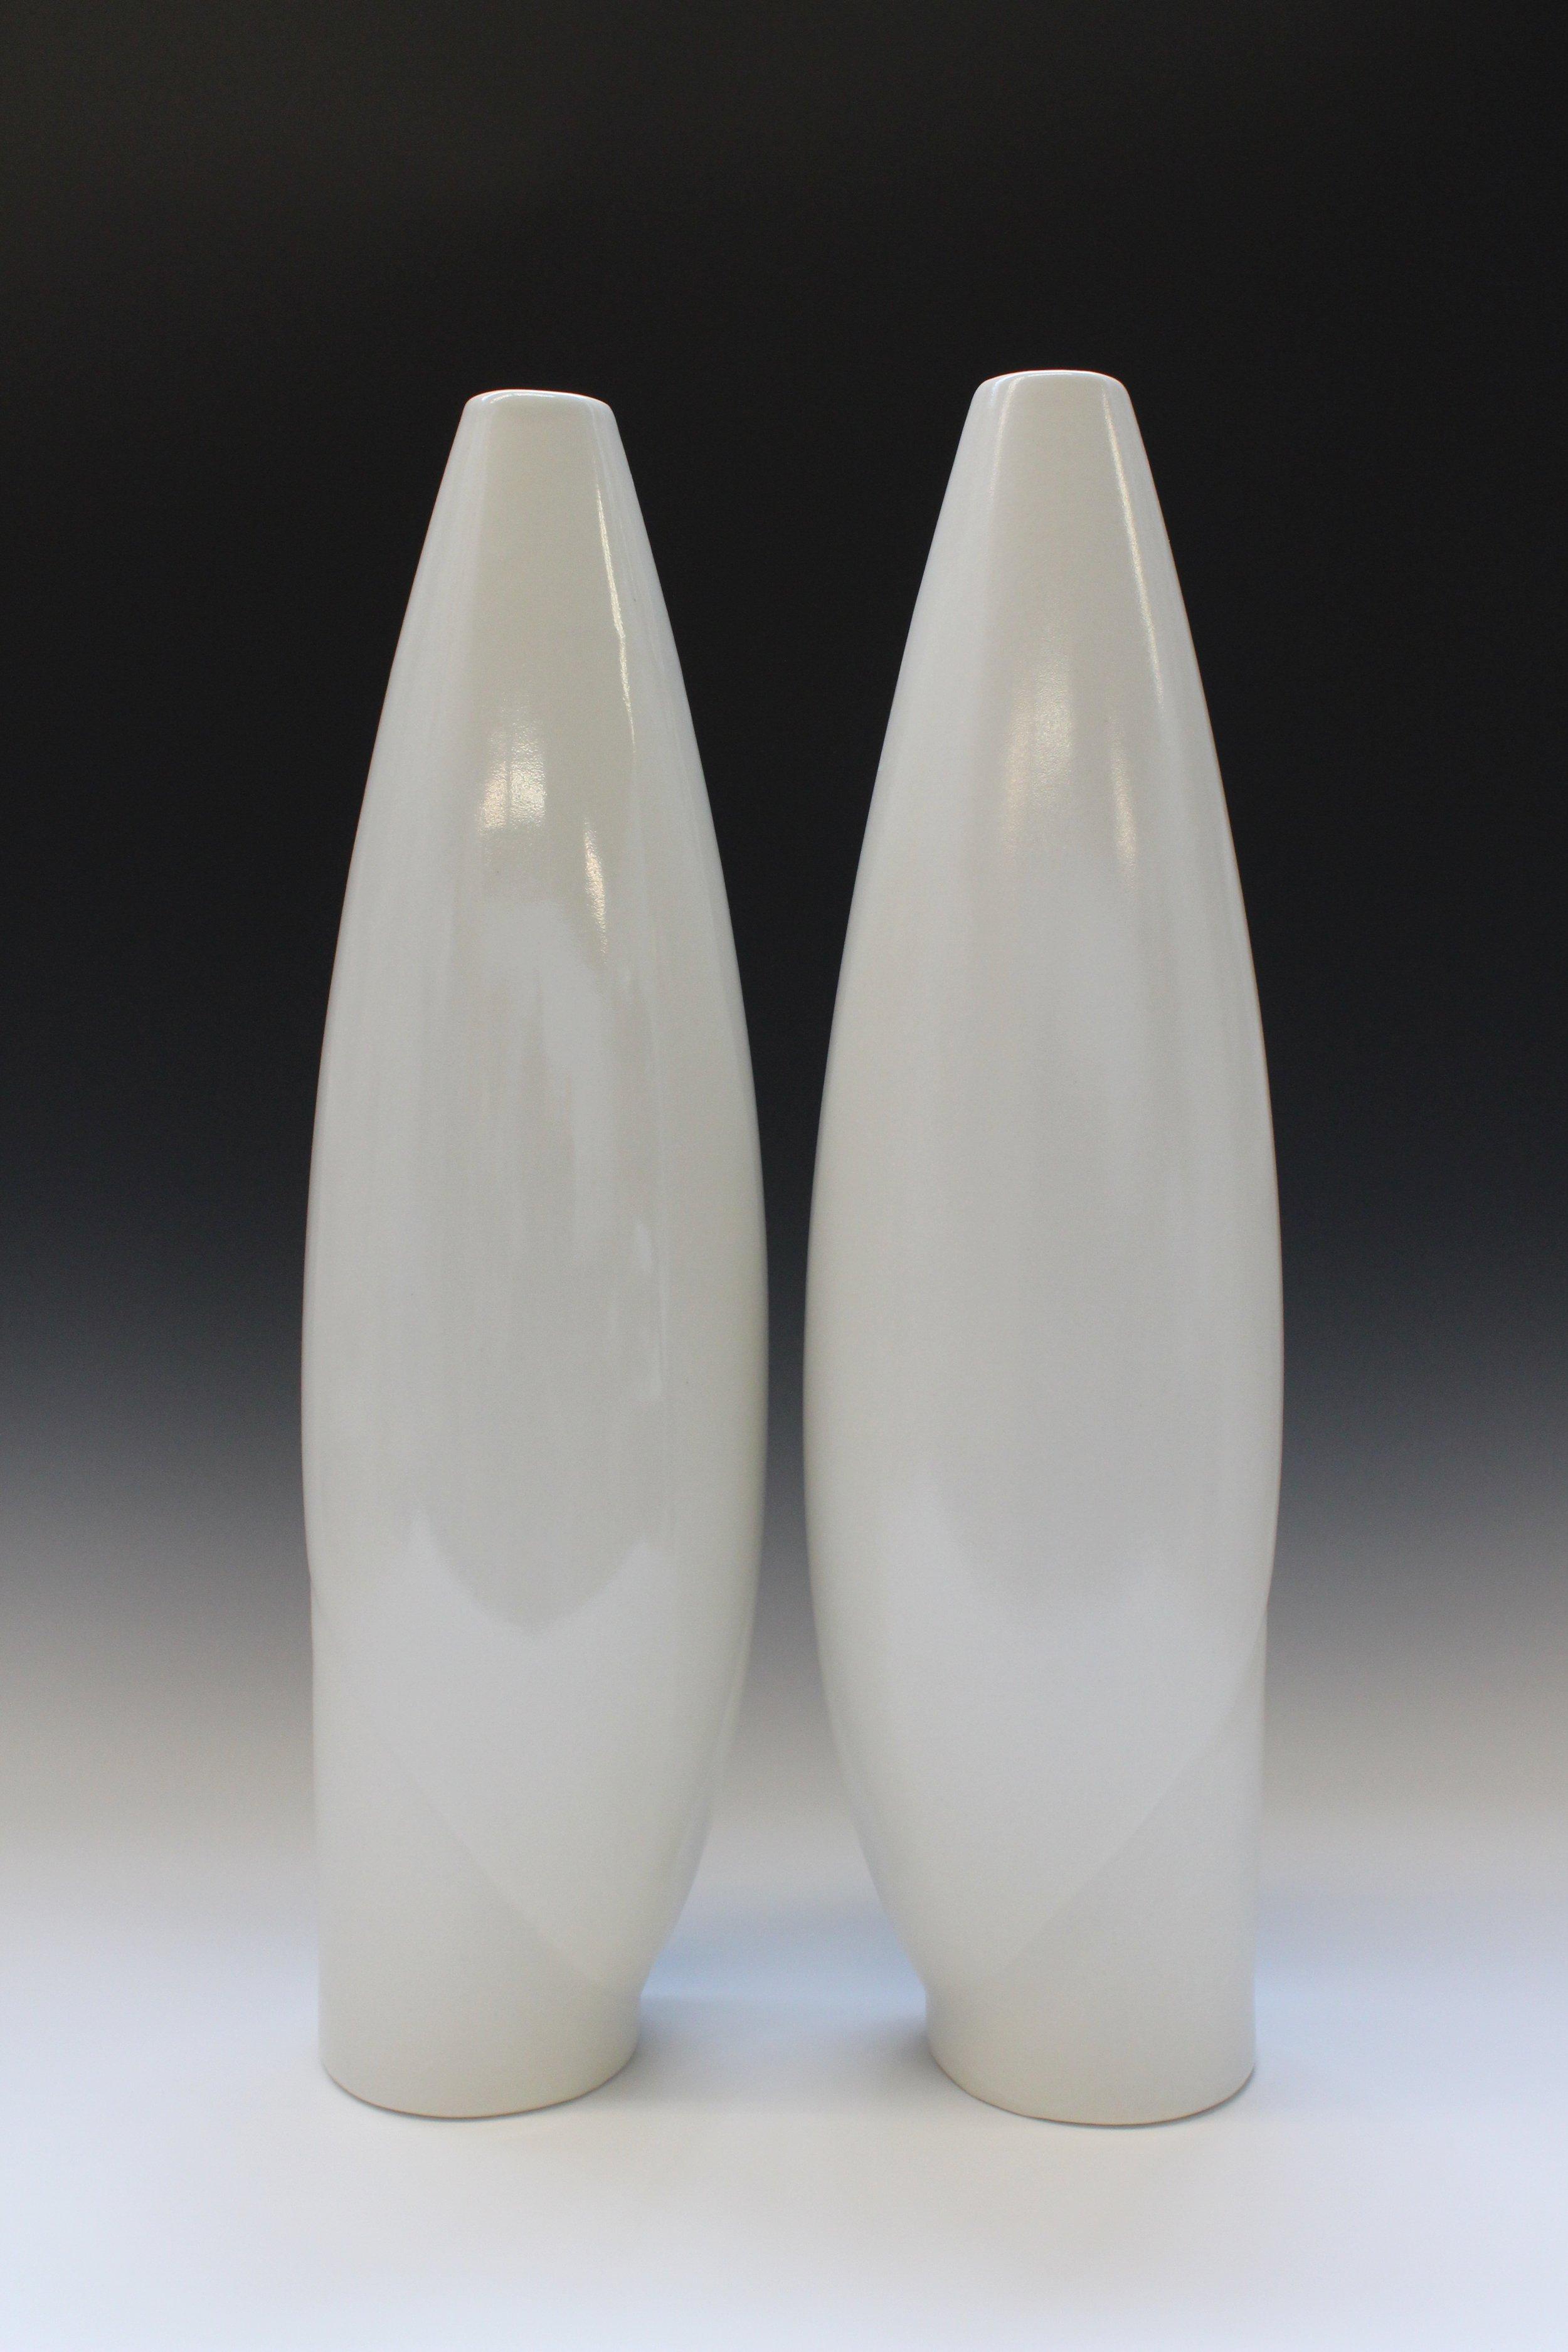 Belly Vases